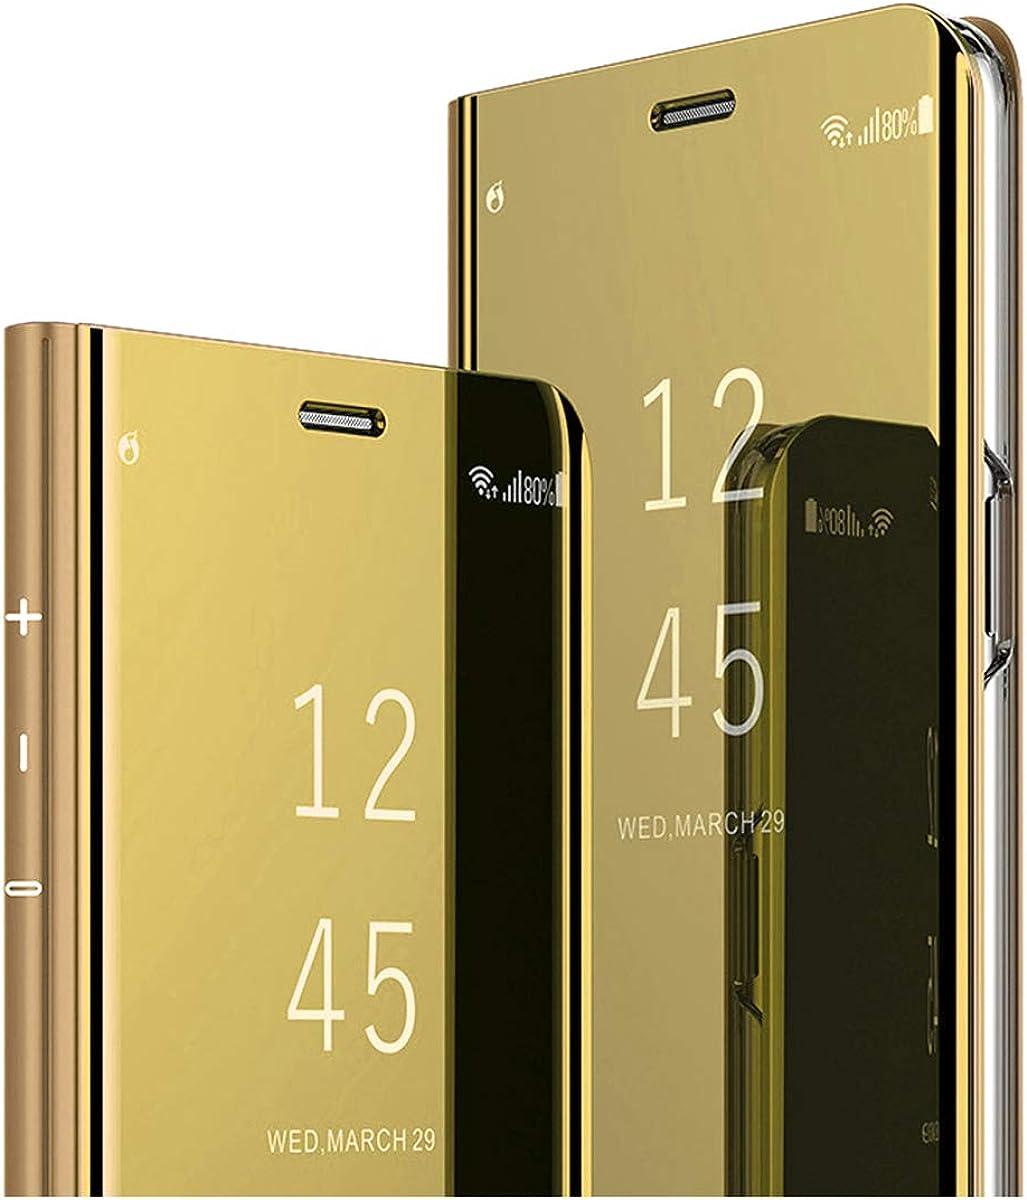 20-Daniei Funda Clear View Standing Cover Xiaomi Redmi Note3, Funda para teléfono con Tapa Protectora con función de Soporte Estuche 360 Grados para Xiaomi Redmi Note3